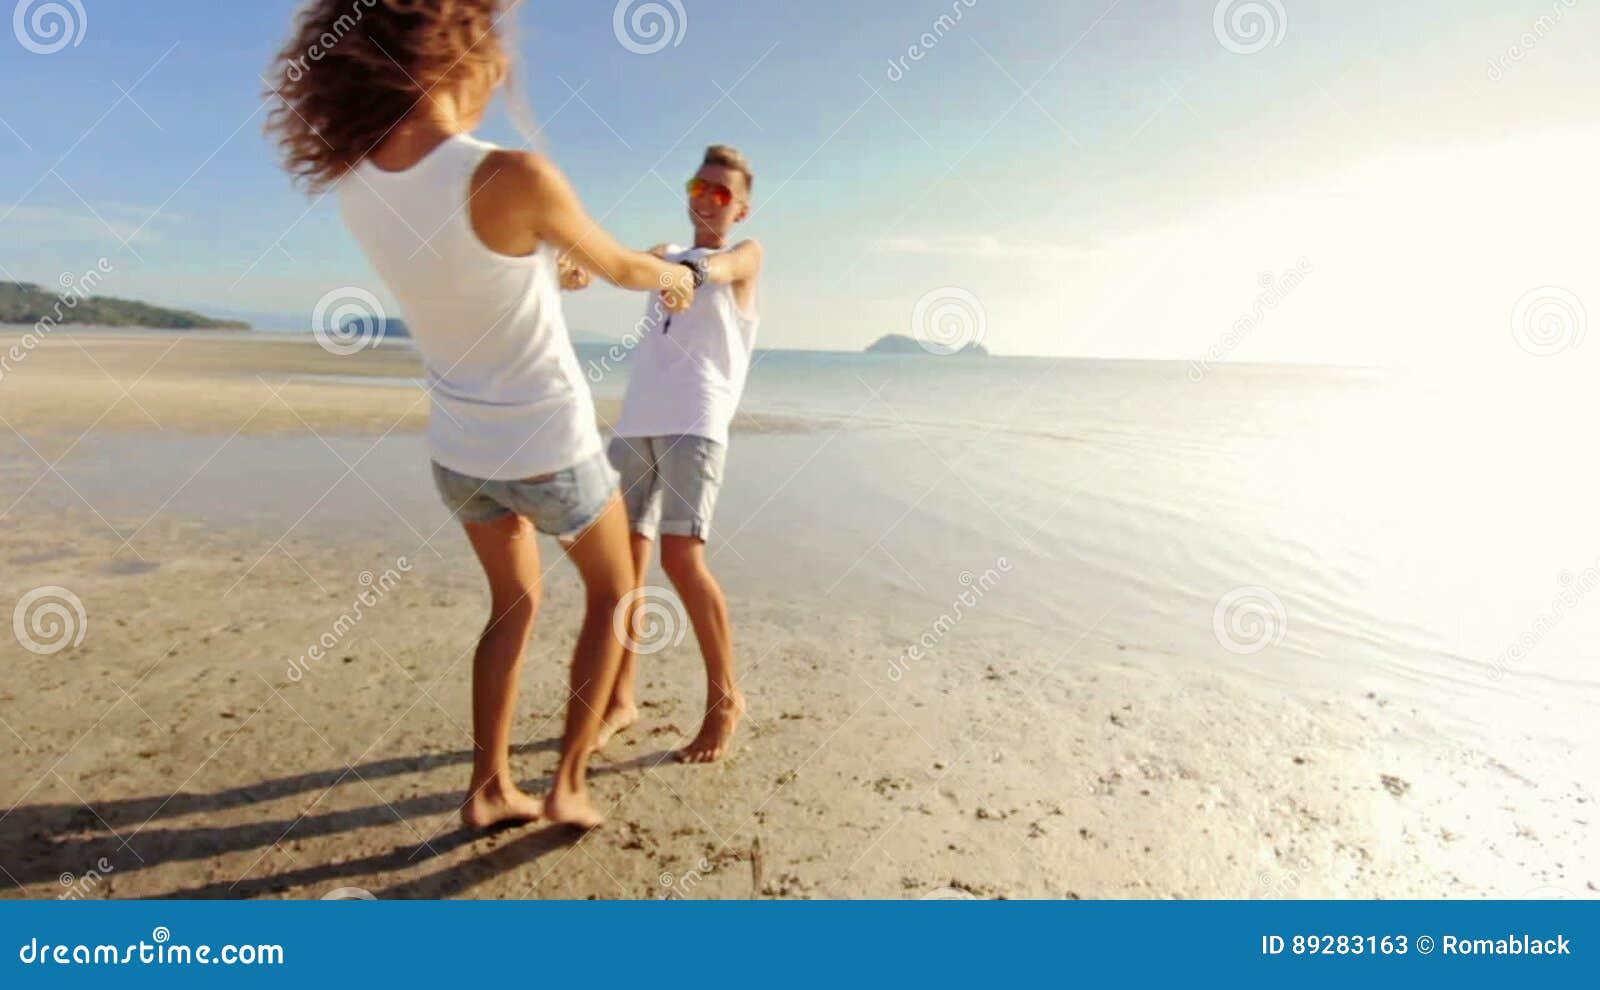 lesbians having fun Outdoor